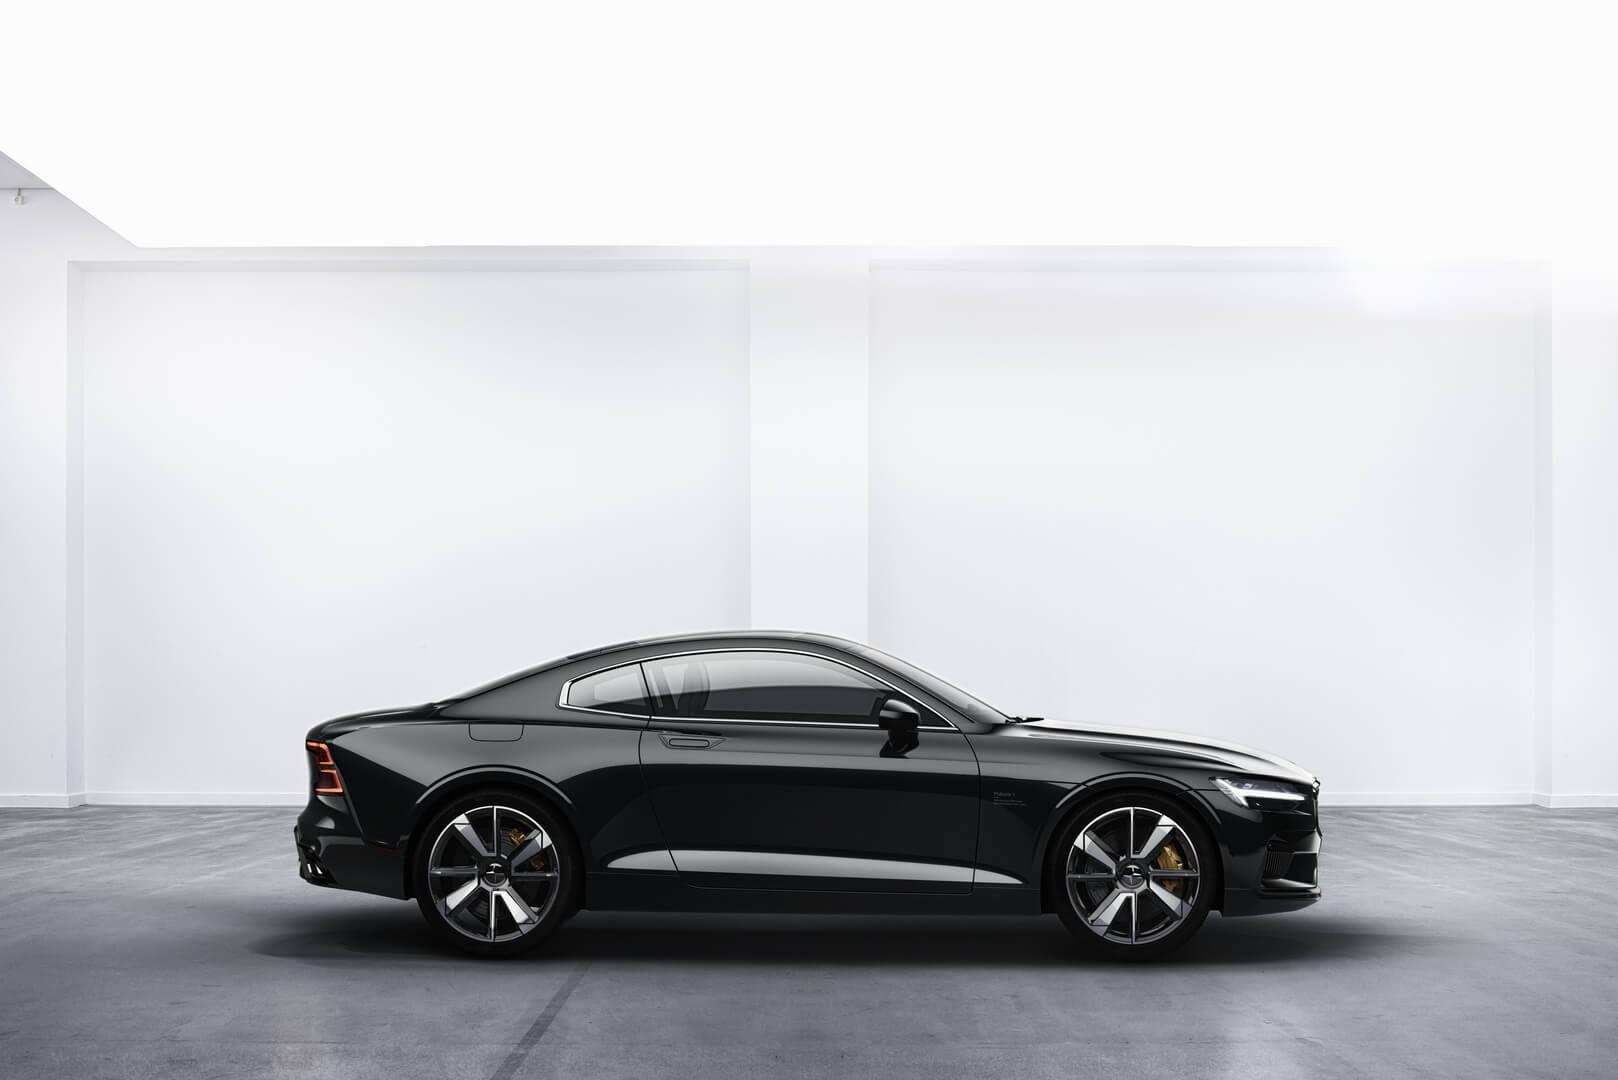 Brend Polestar kompanii Volvo pristupil k sborke prototipa sportkara